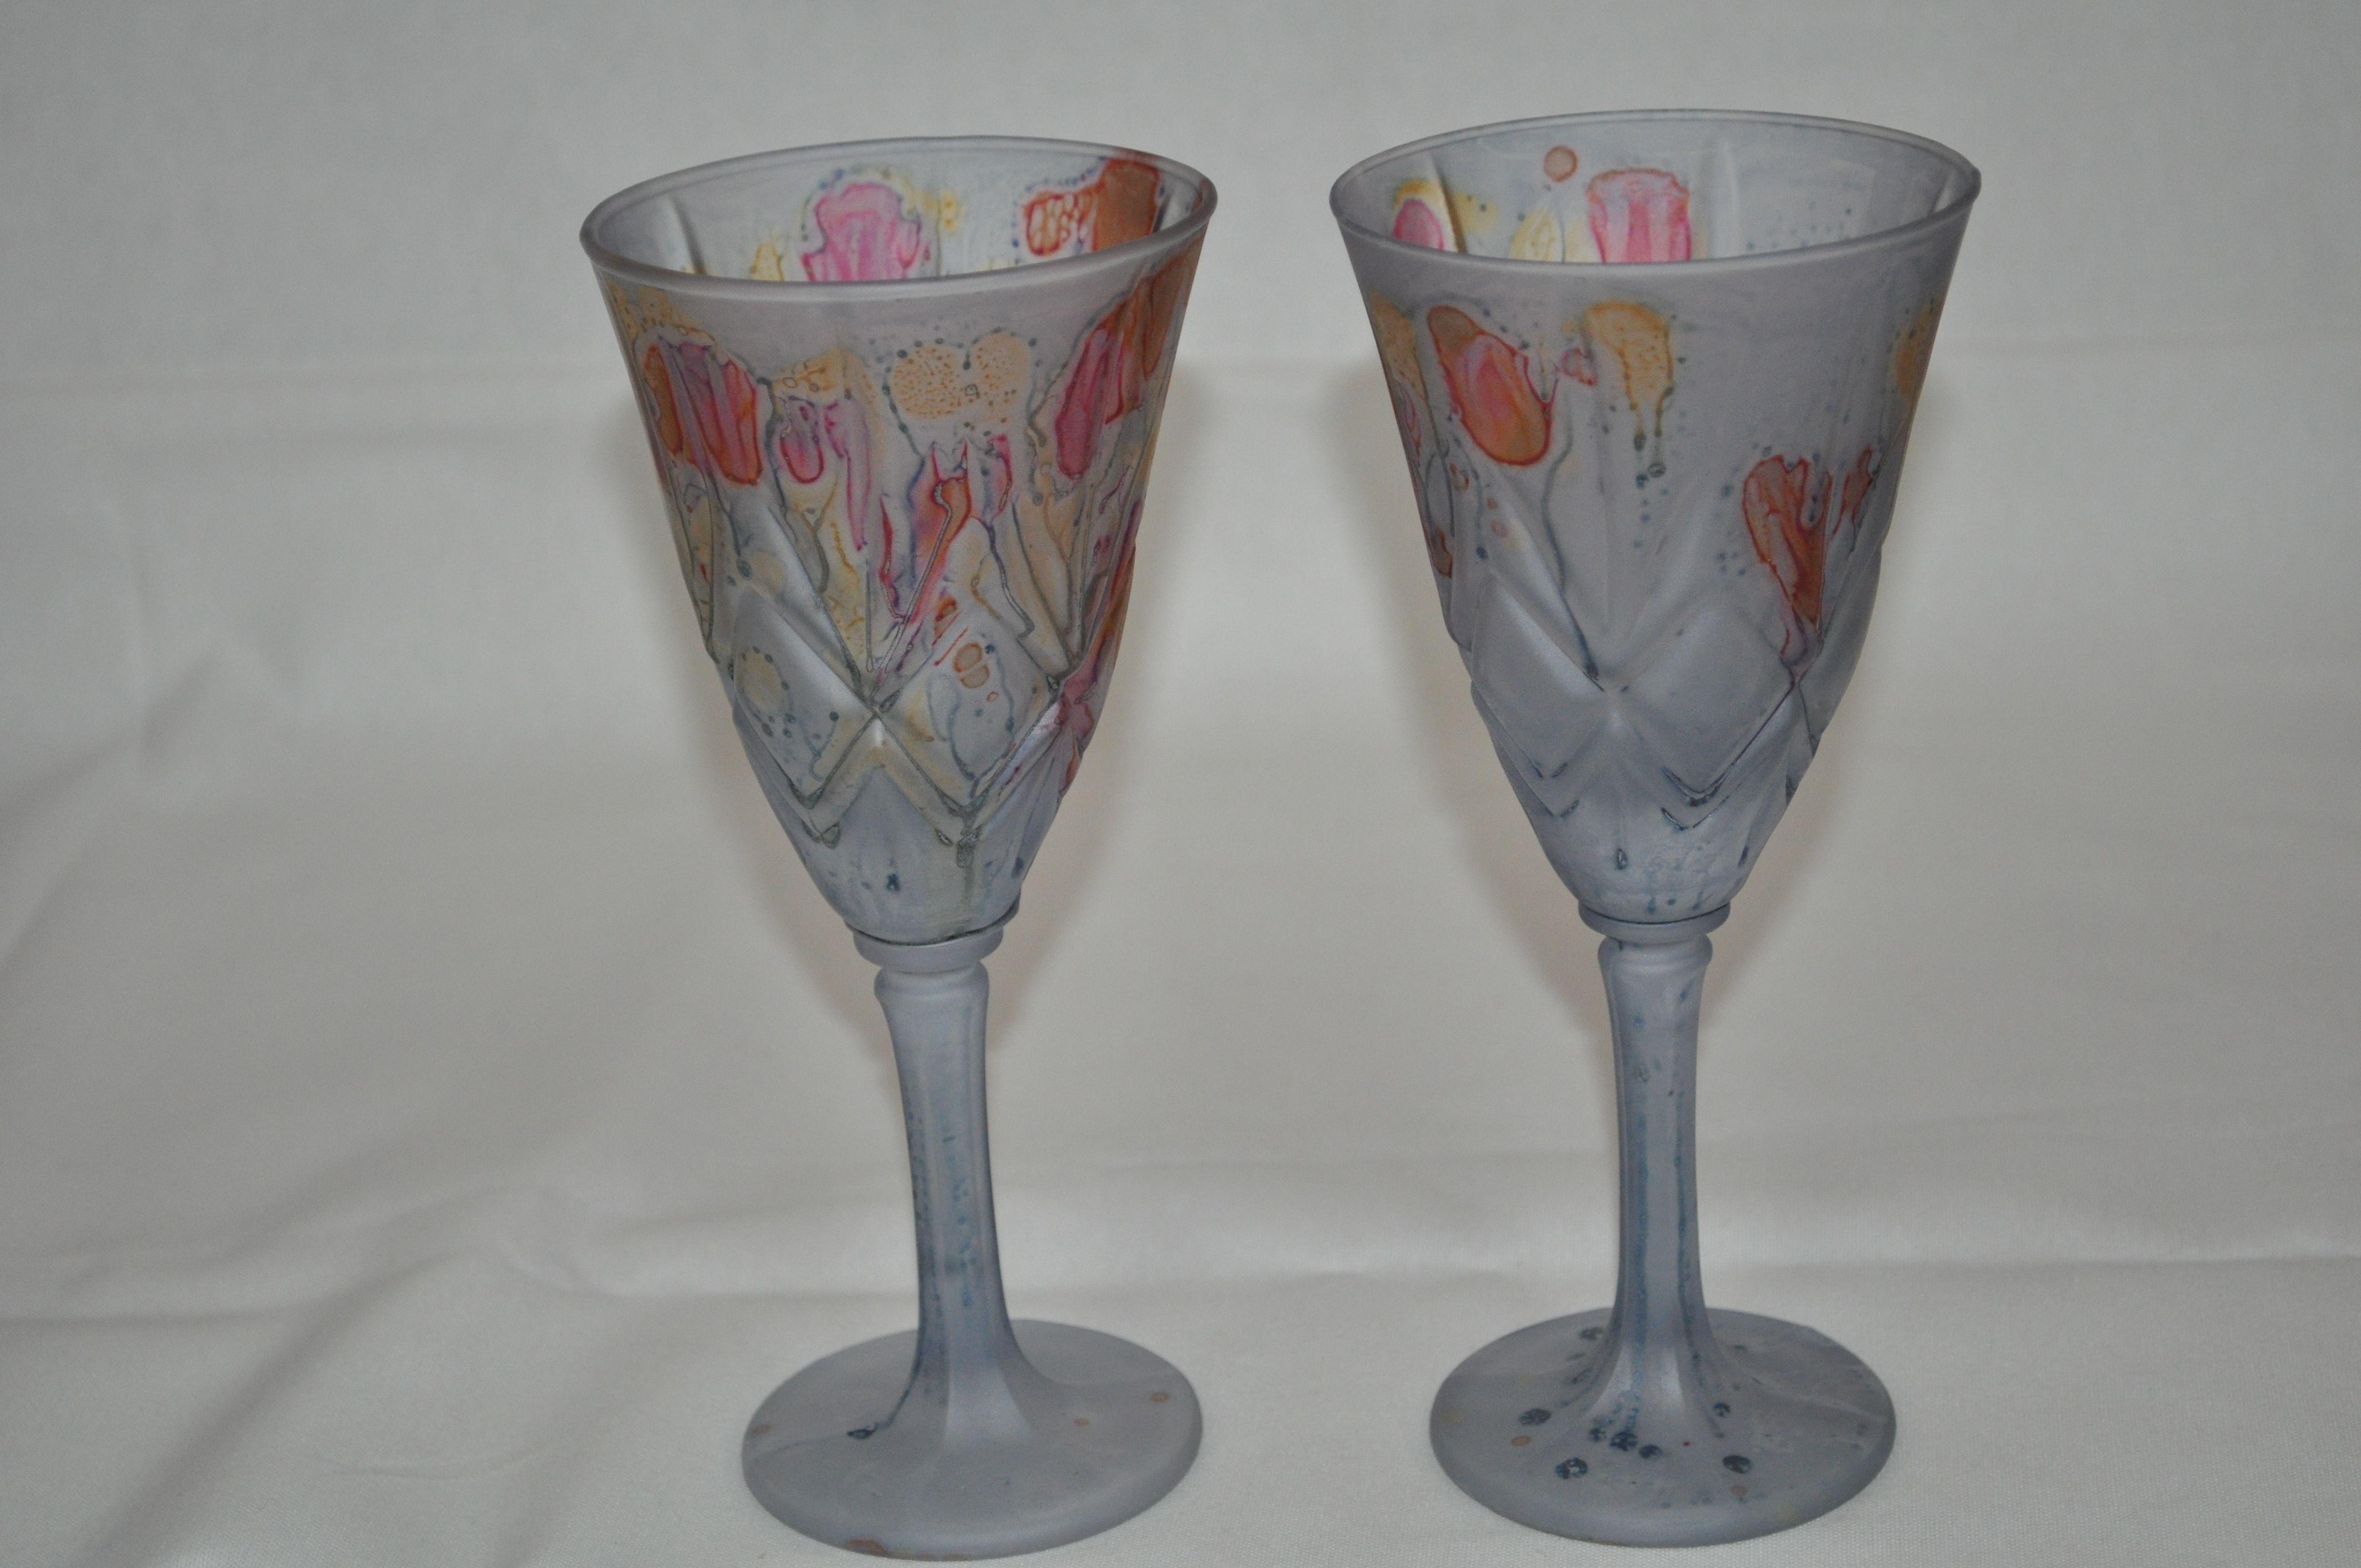 Hebron Glassware Jericho Israel Israel Middle East Glass